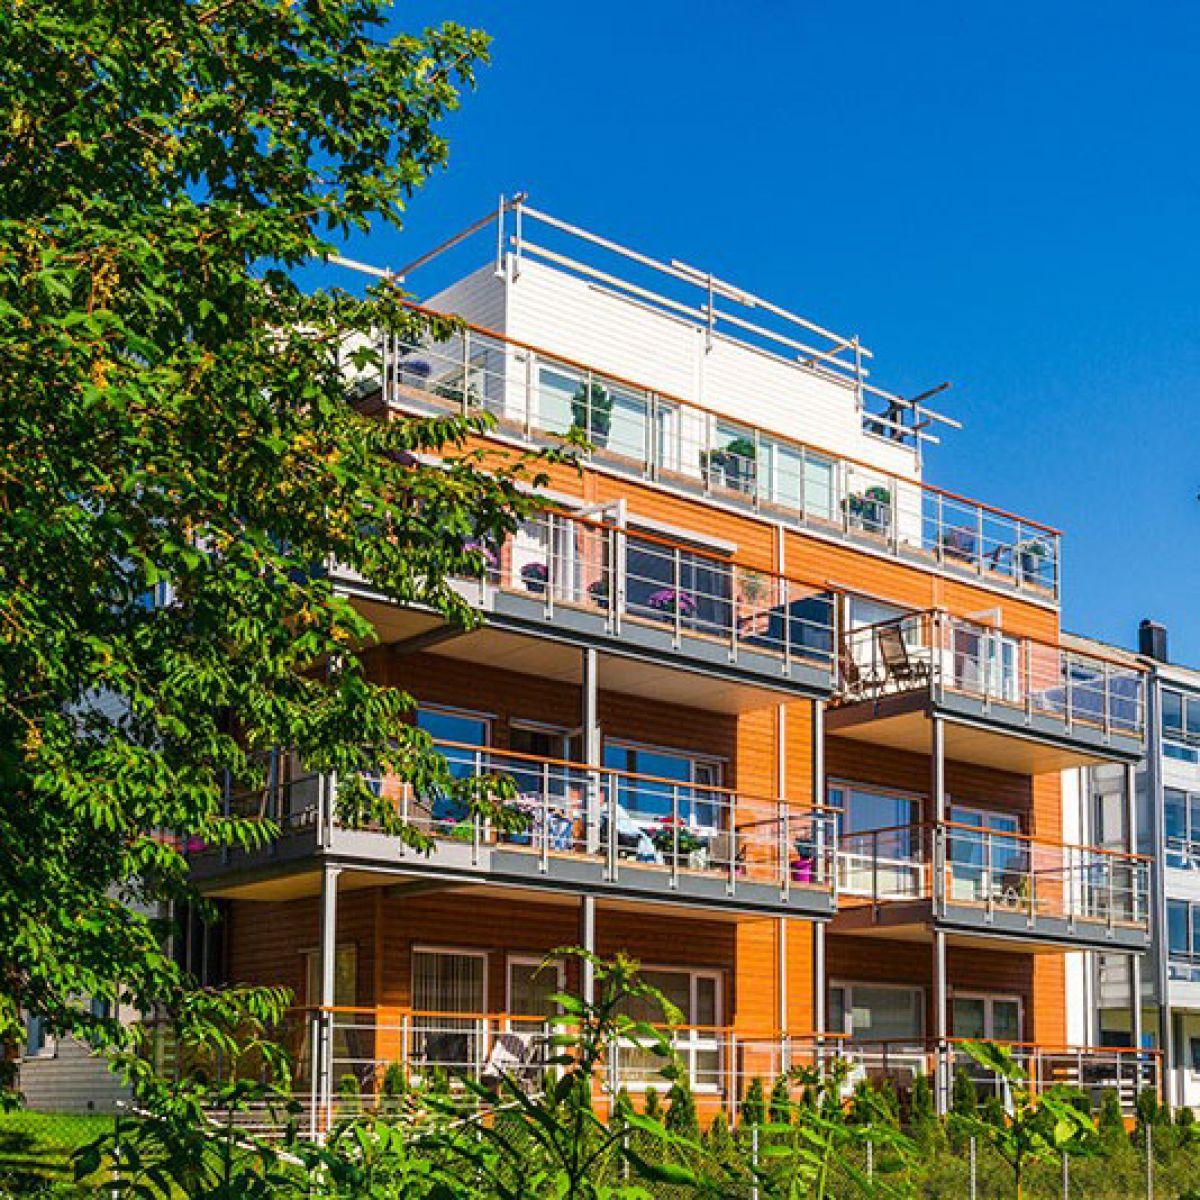 Fagerliveien 6 in Alesund, Norway